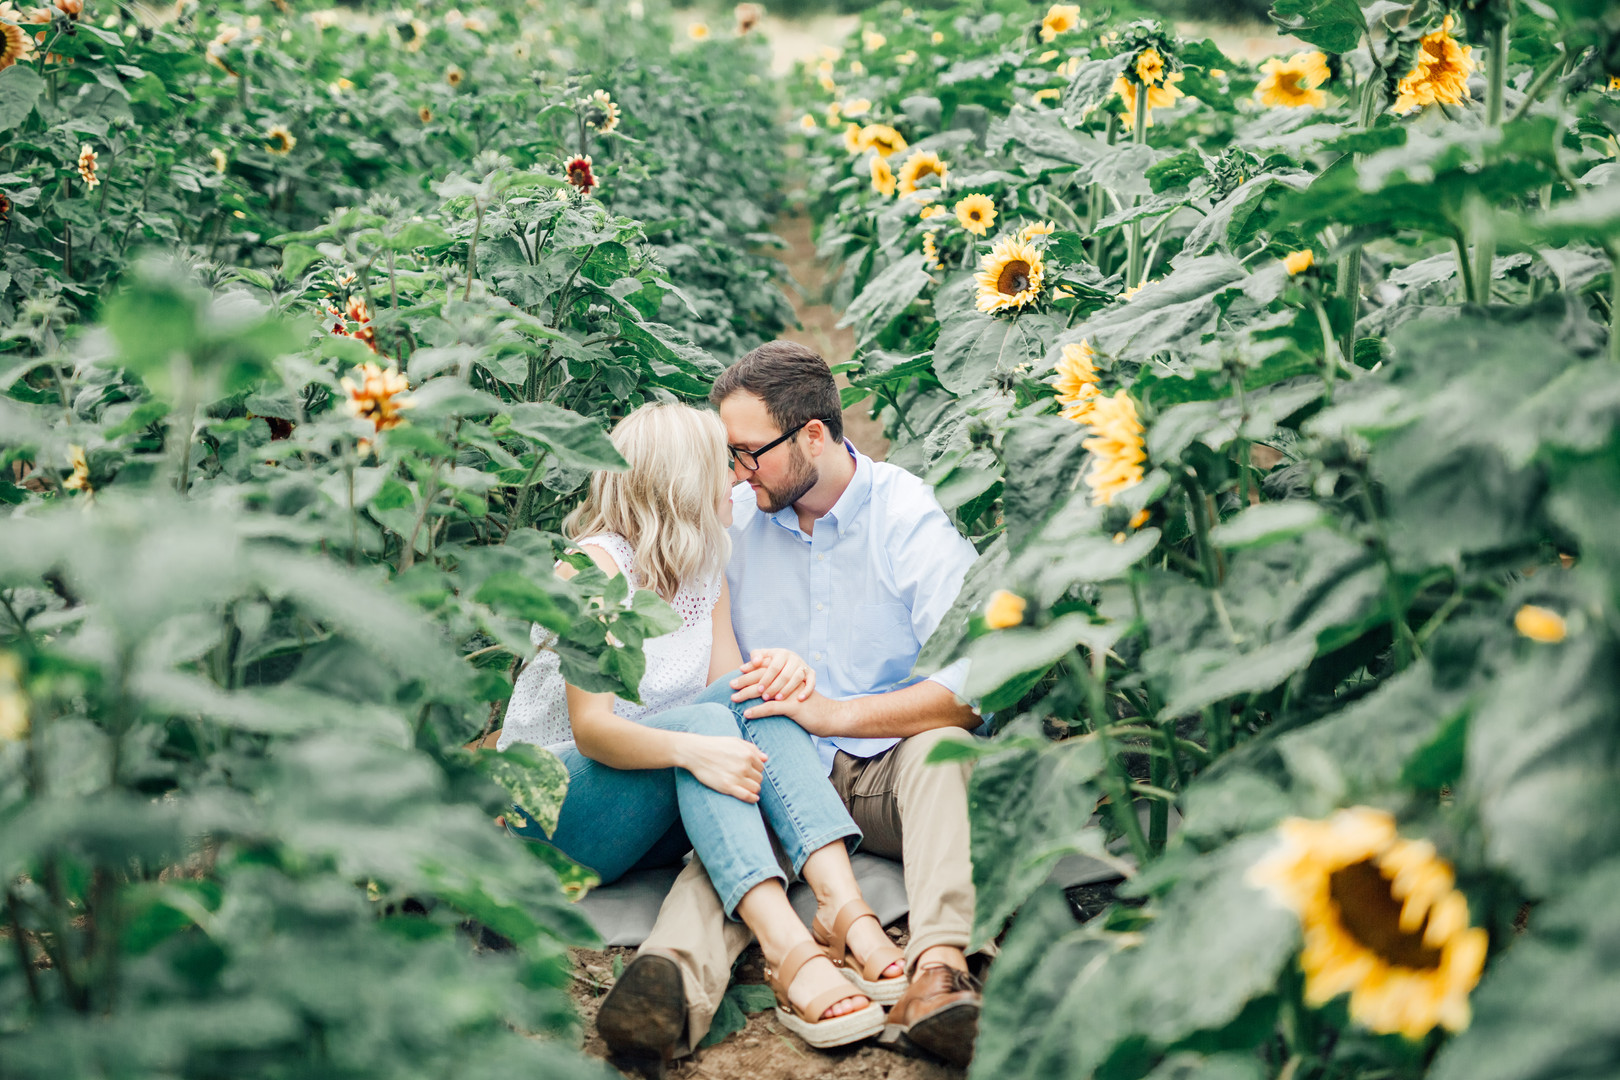 U-Pick Flower Farm, Farm Session, PNW Engagement Session Photography-Something Minted